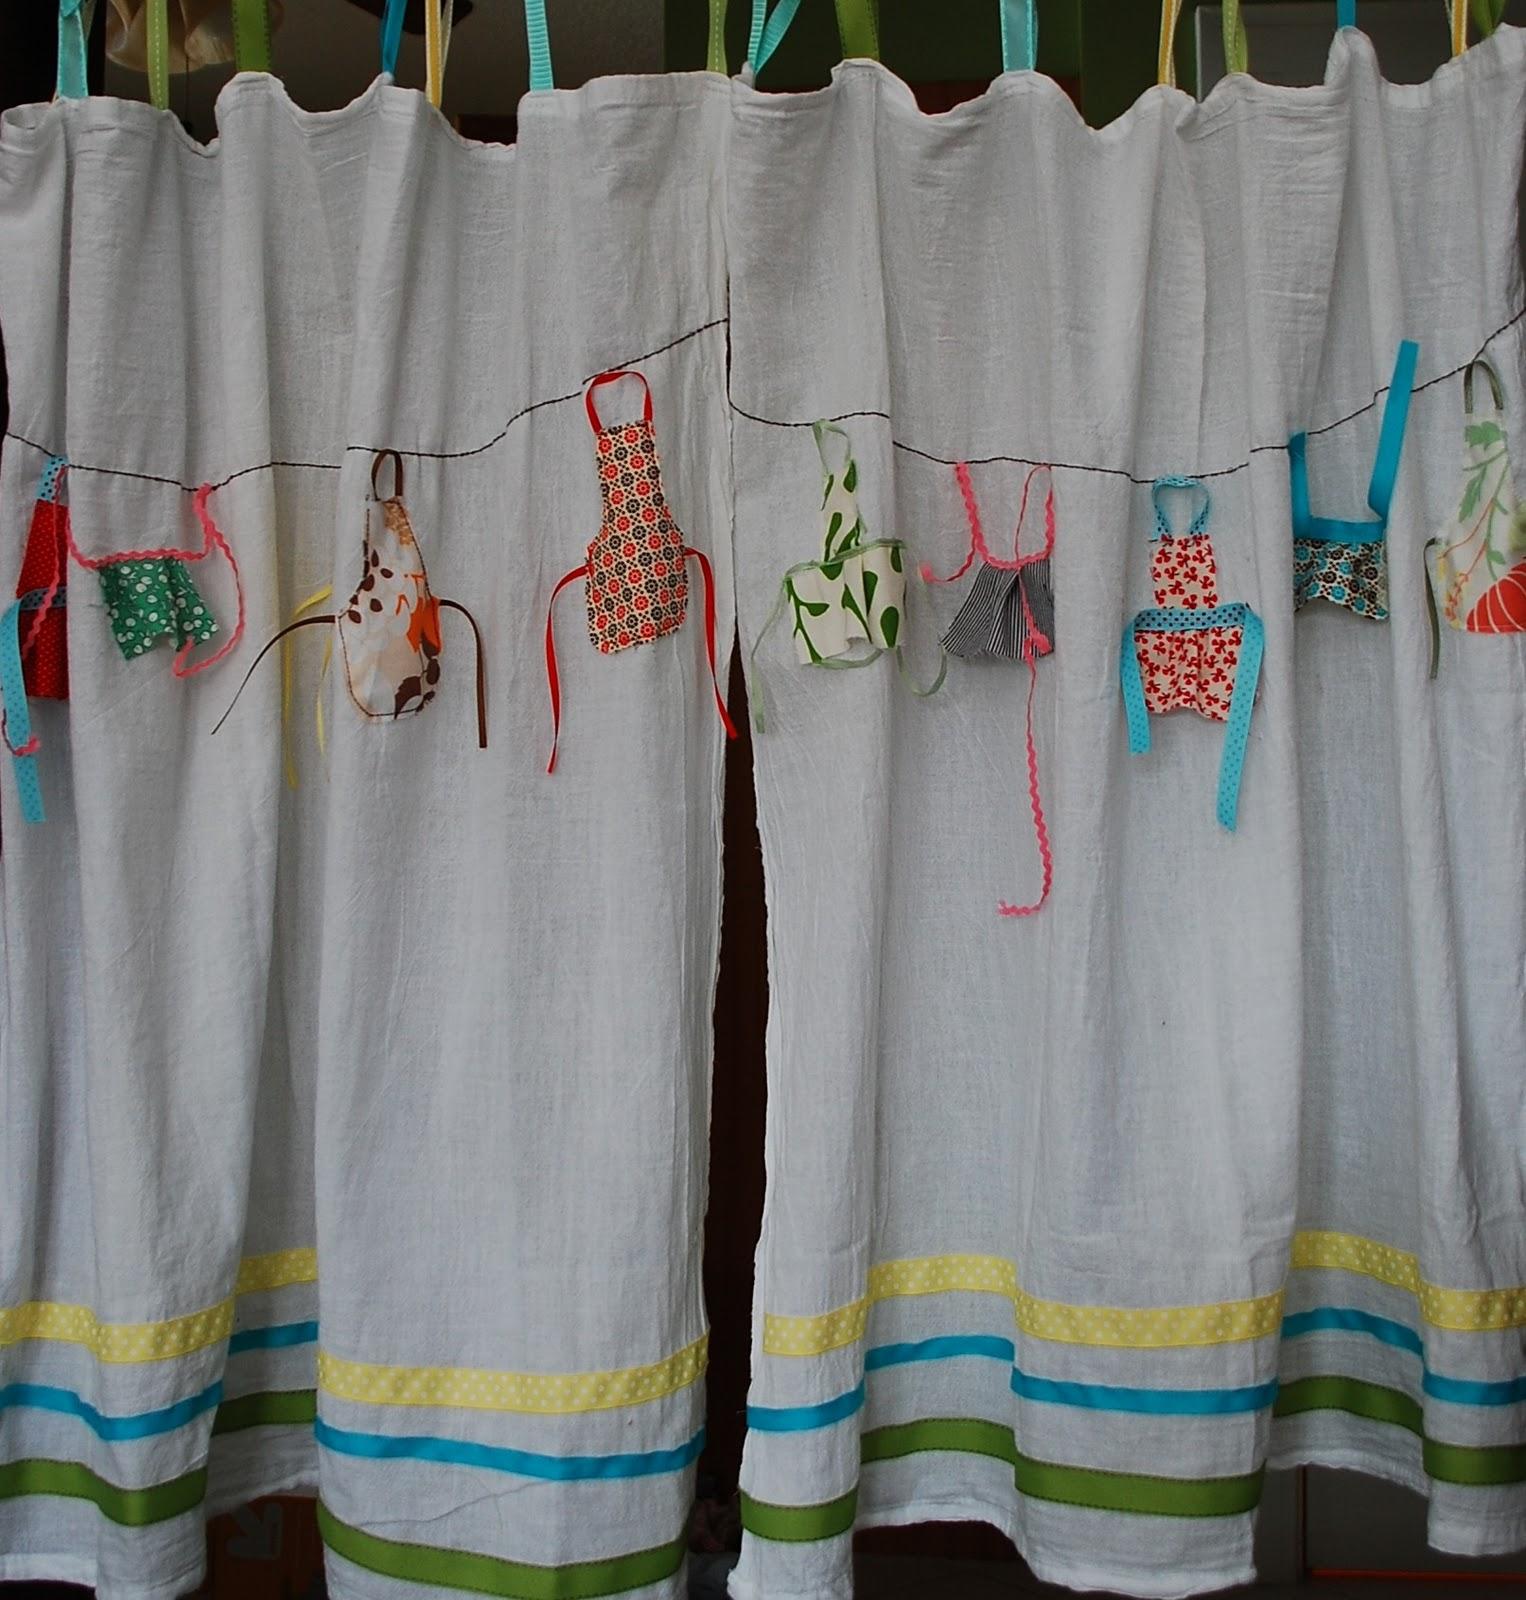 Kitchen Curtain Fabric: Corduroyscloset: SYTYC Week 8 Scrap Curtains